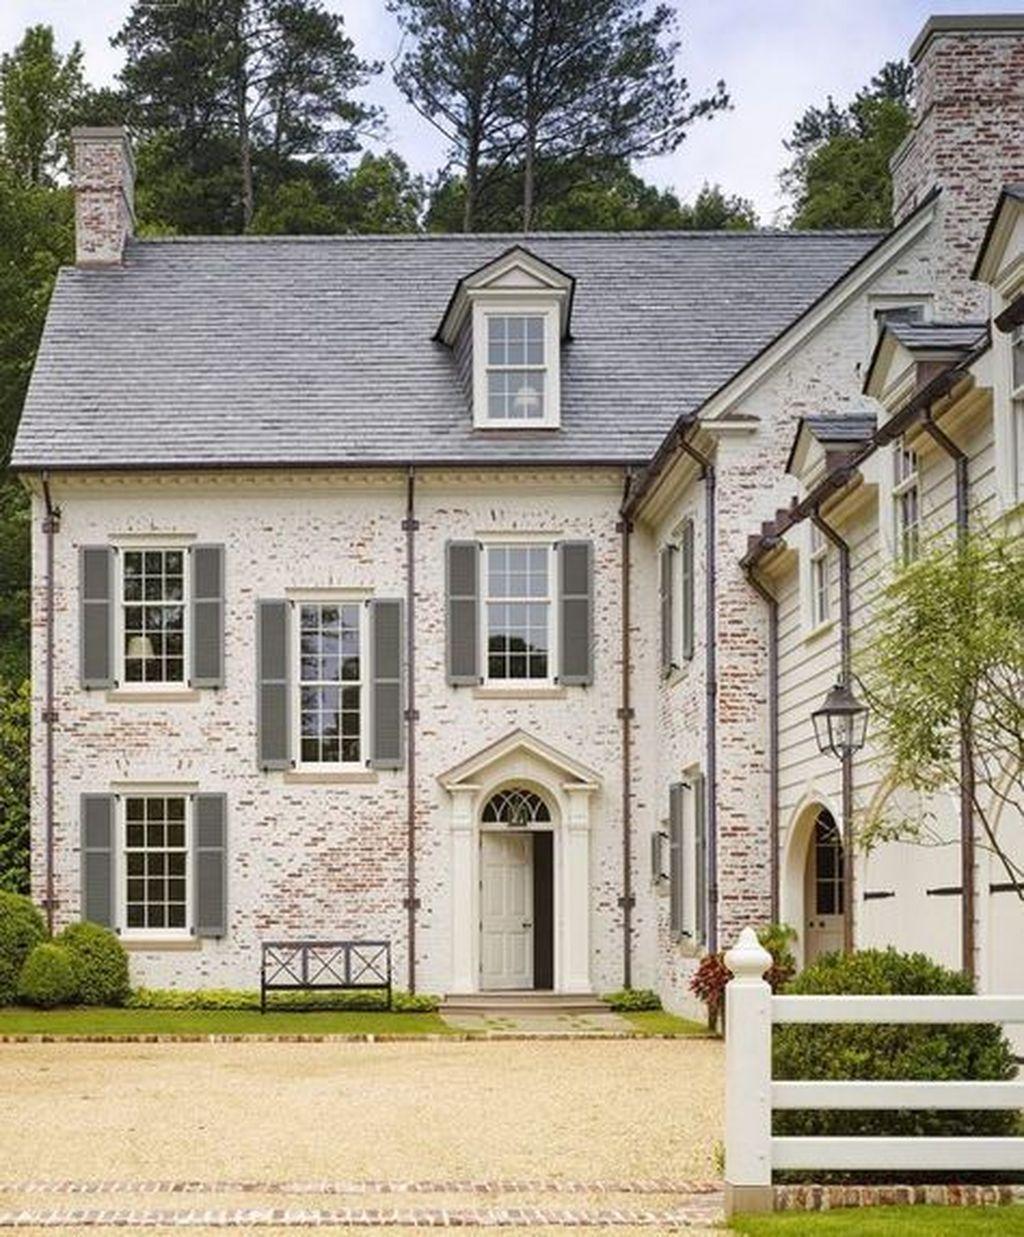 Impressive Brick House Exterior Design Ideas That You Definitely Like 01